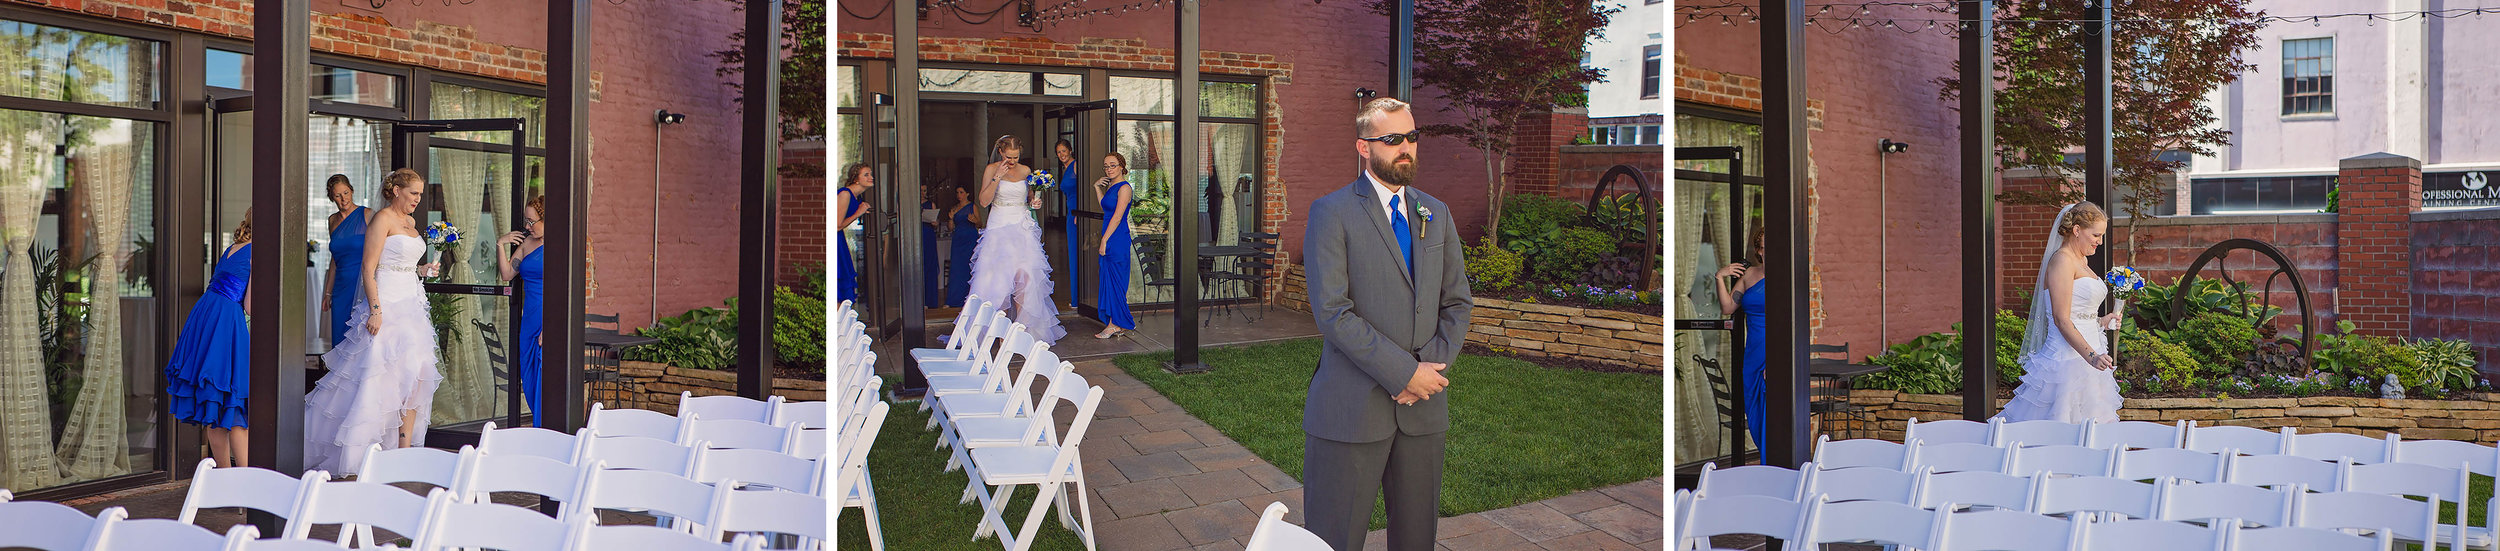 savoy-springfield-wedding-photographer (27).jpg